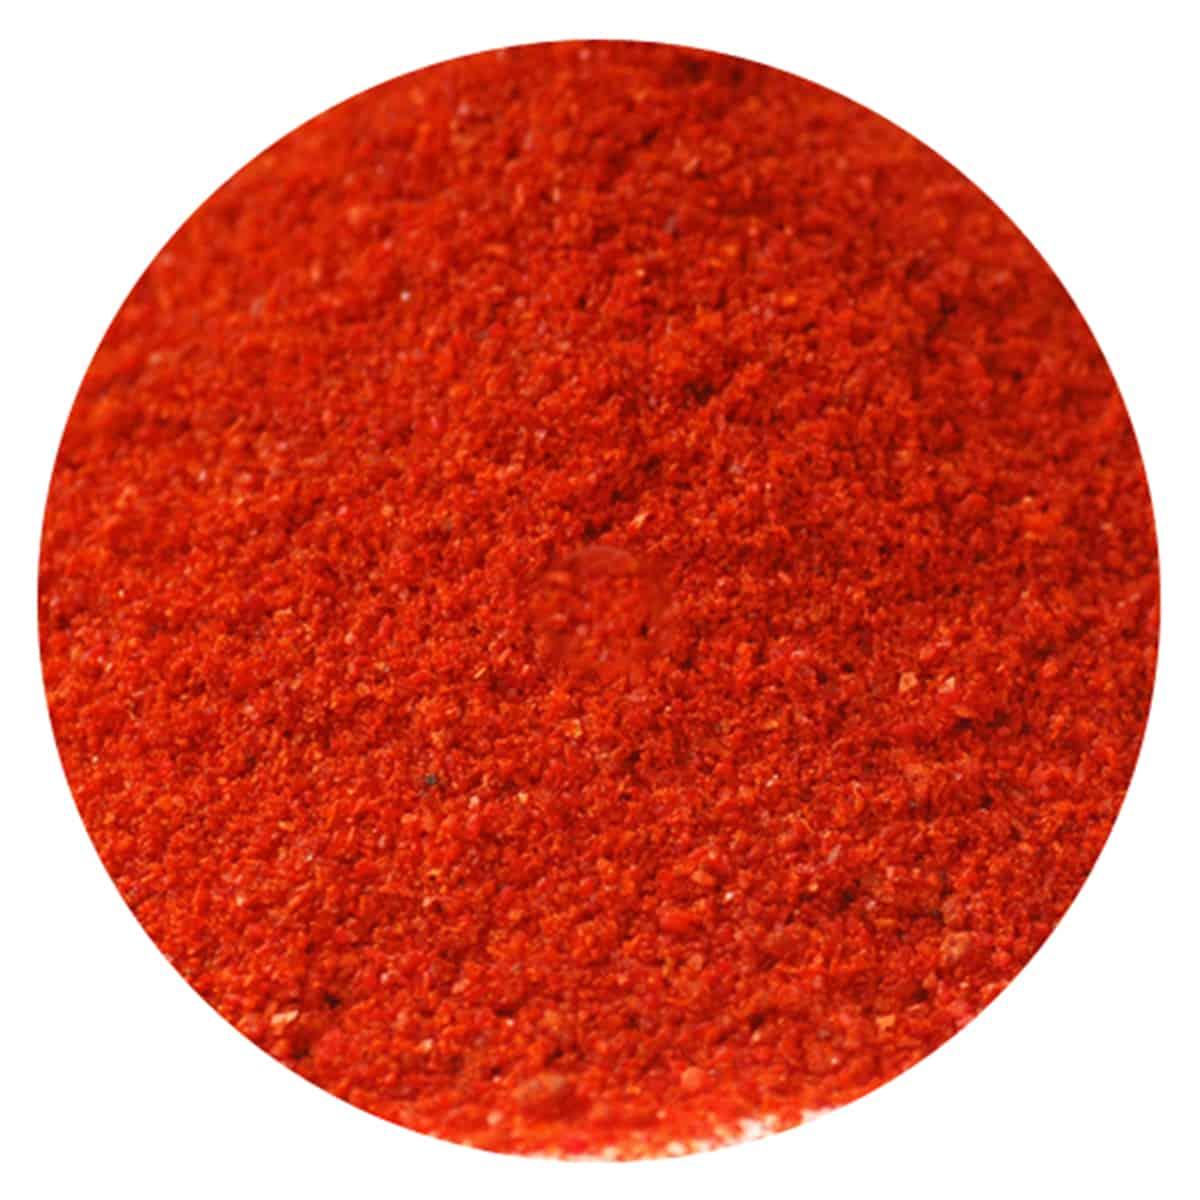 Buy IAG Foods Kashmiri Red Chilli Powder - 1 kg